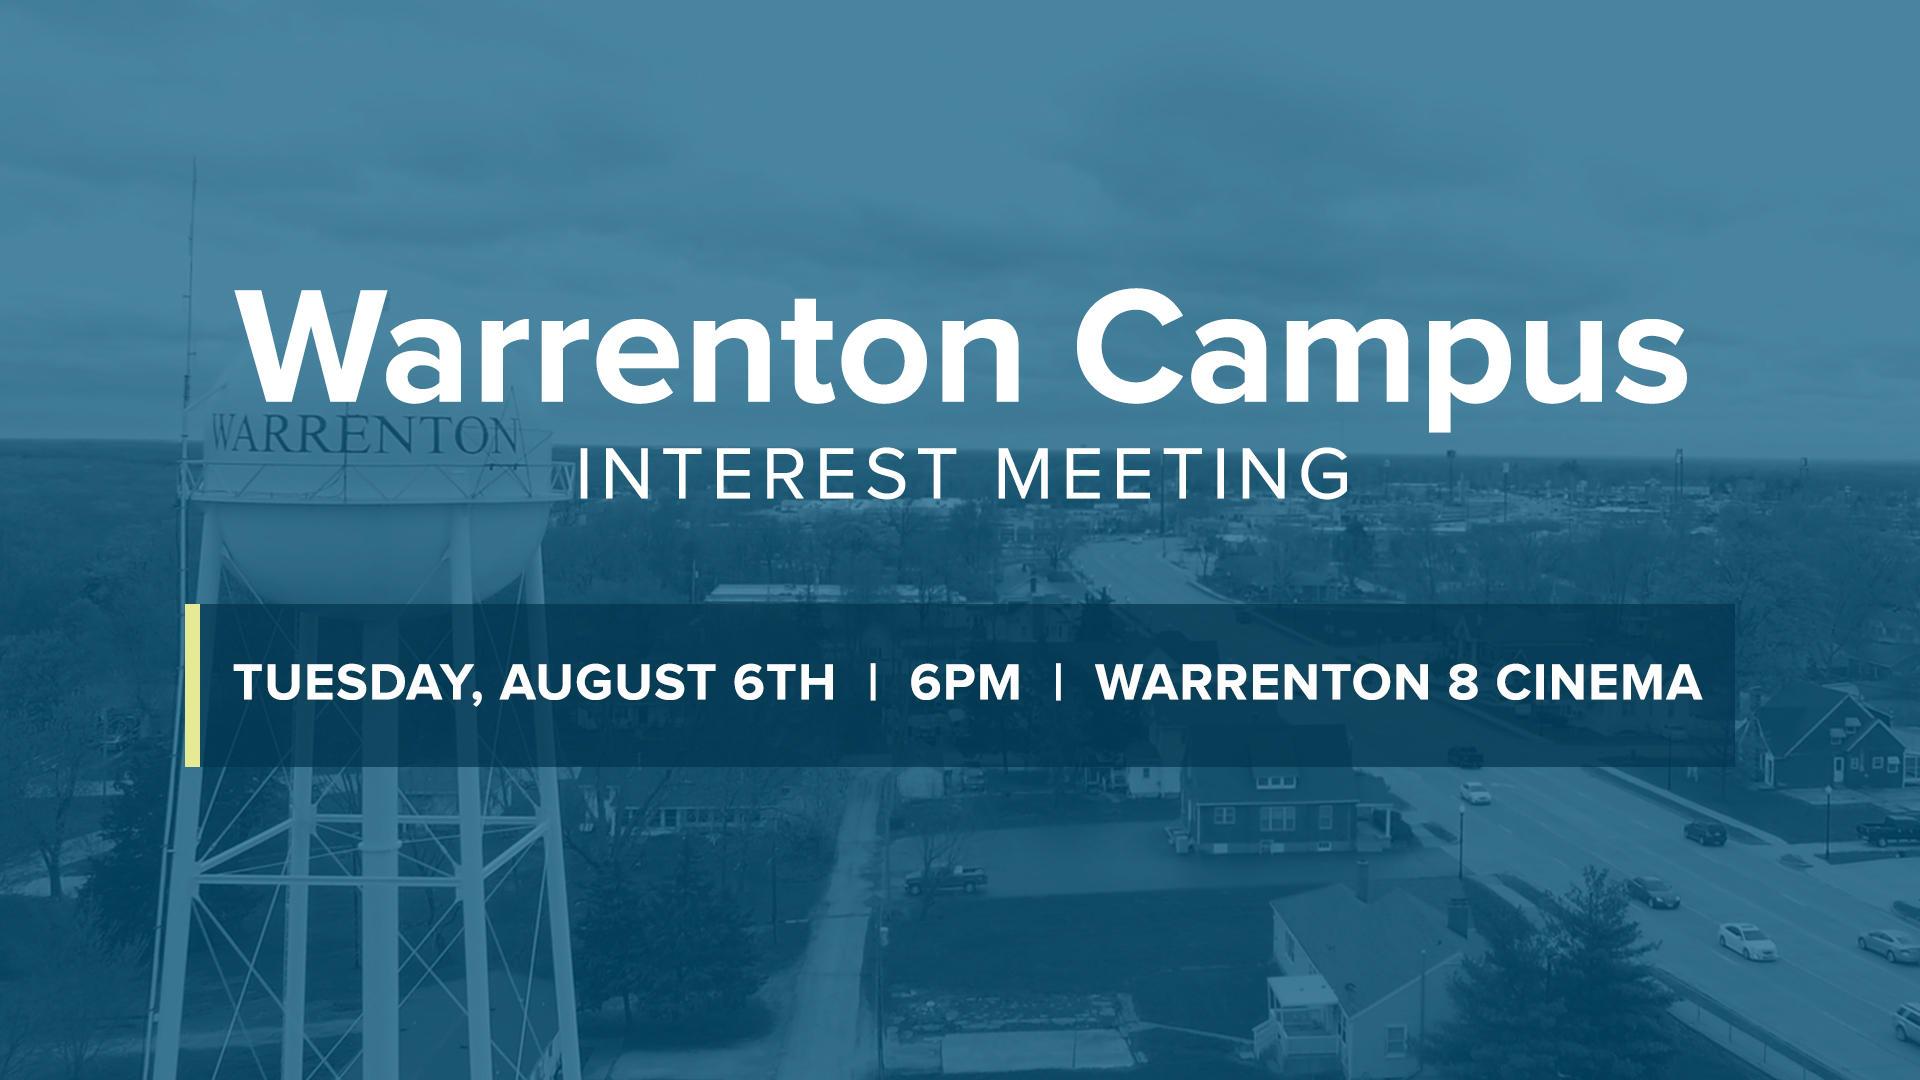 Warrenton Interest Meeting 080619.jpg